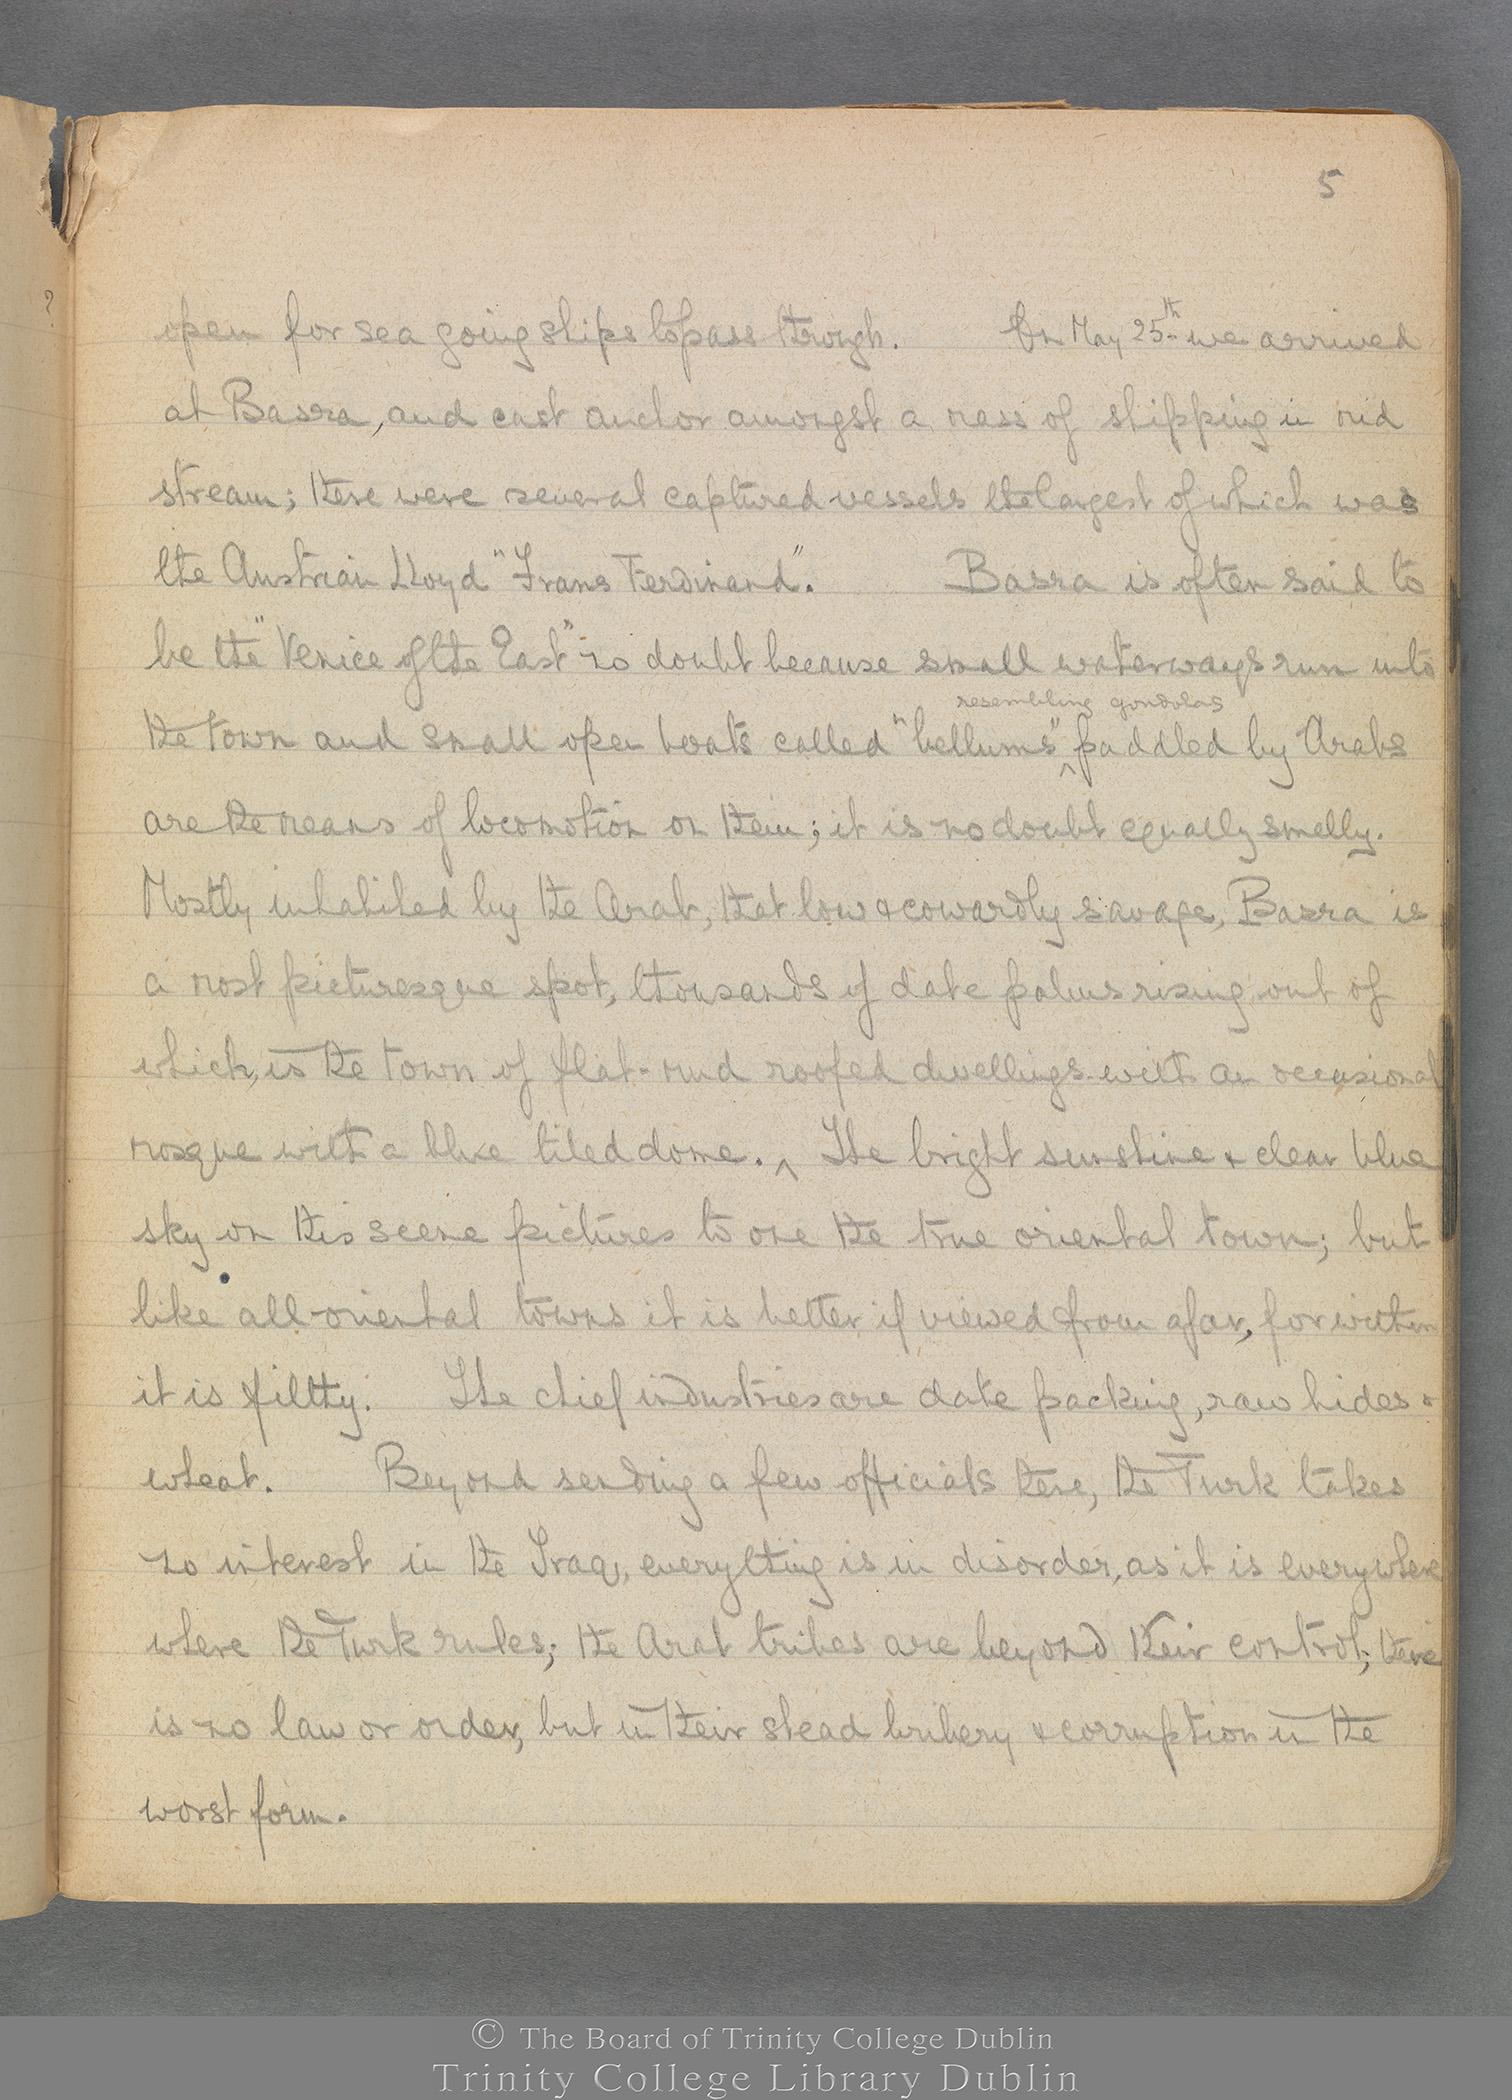 TCD MS 3414 folio 5 recto